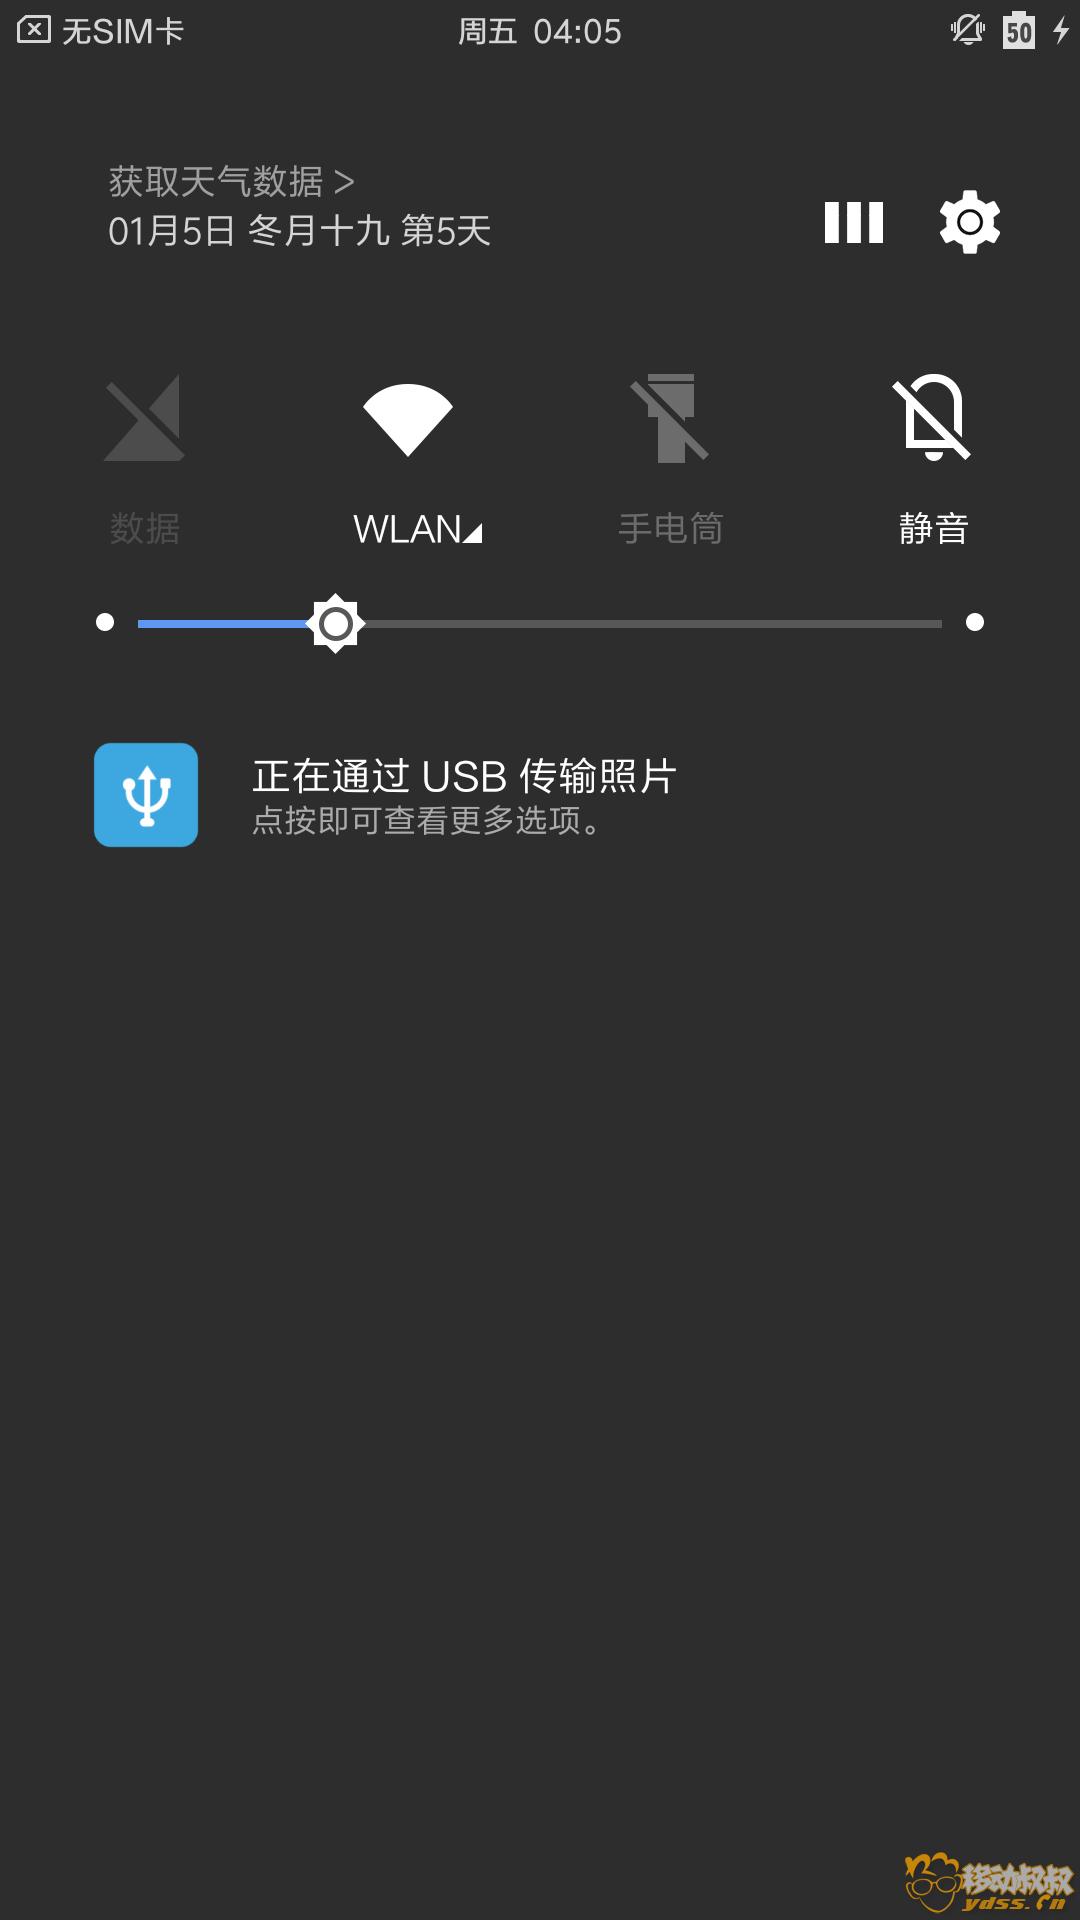 Screenshot_2018-01-05-16-05-25-411_com.android.settings.png